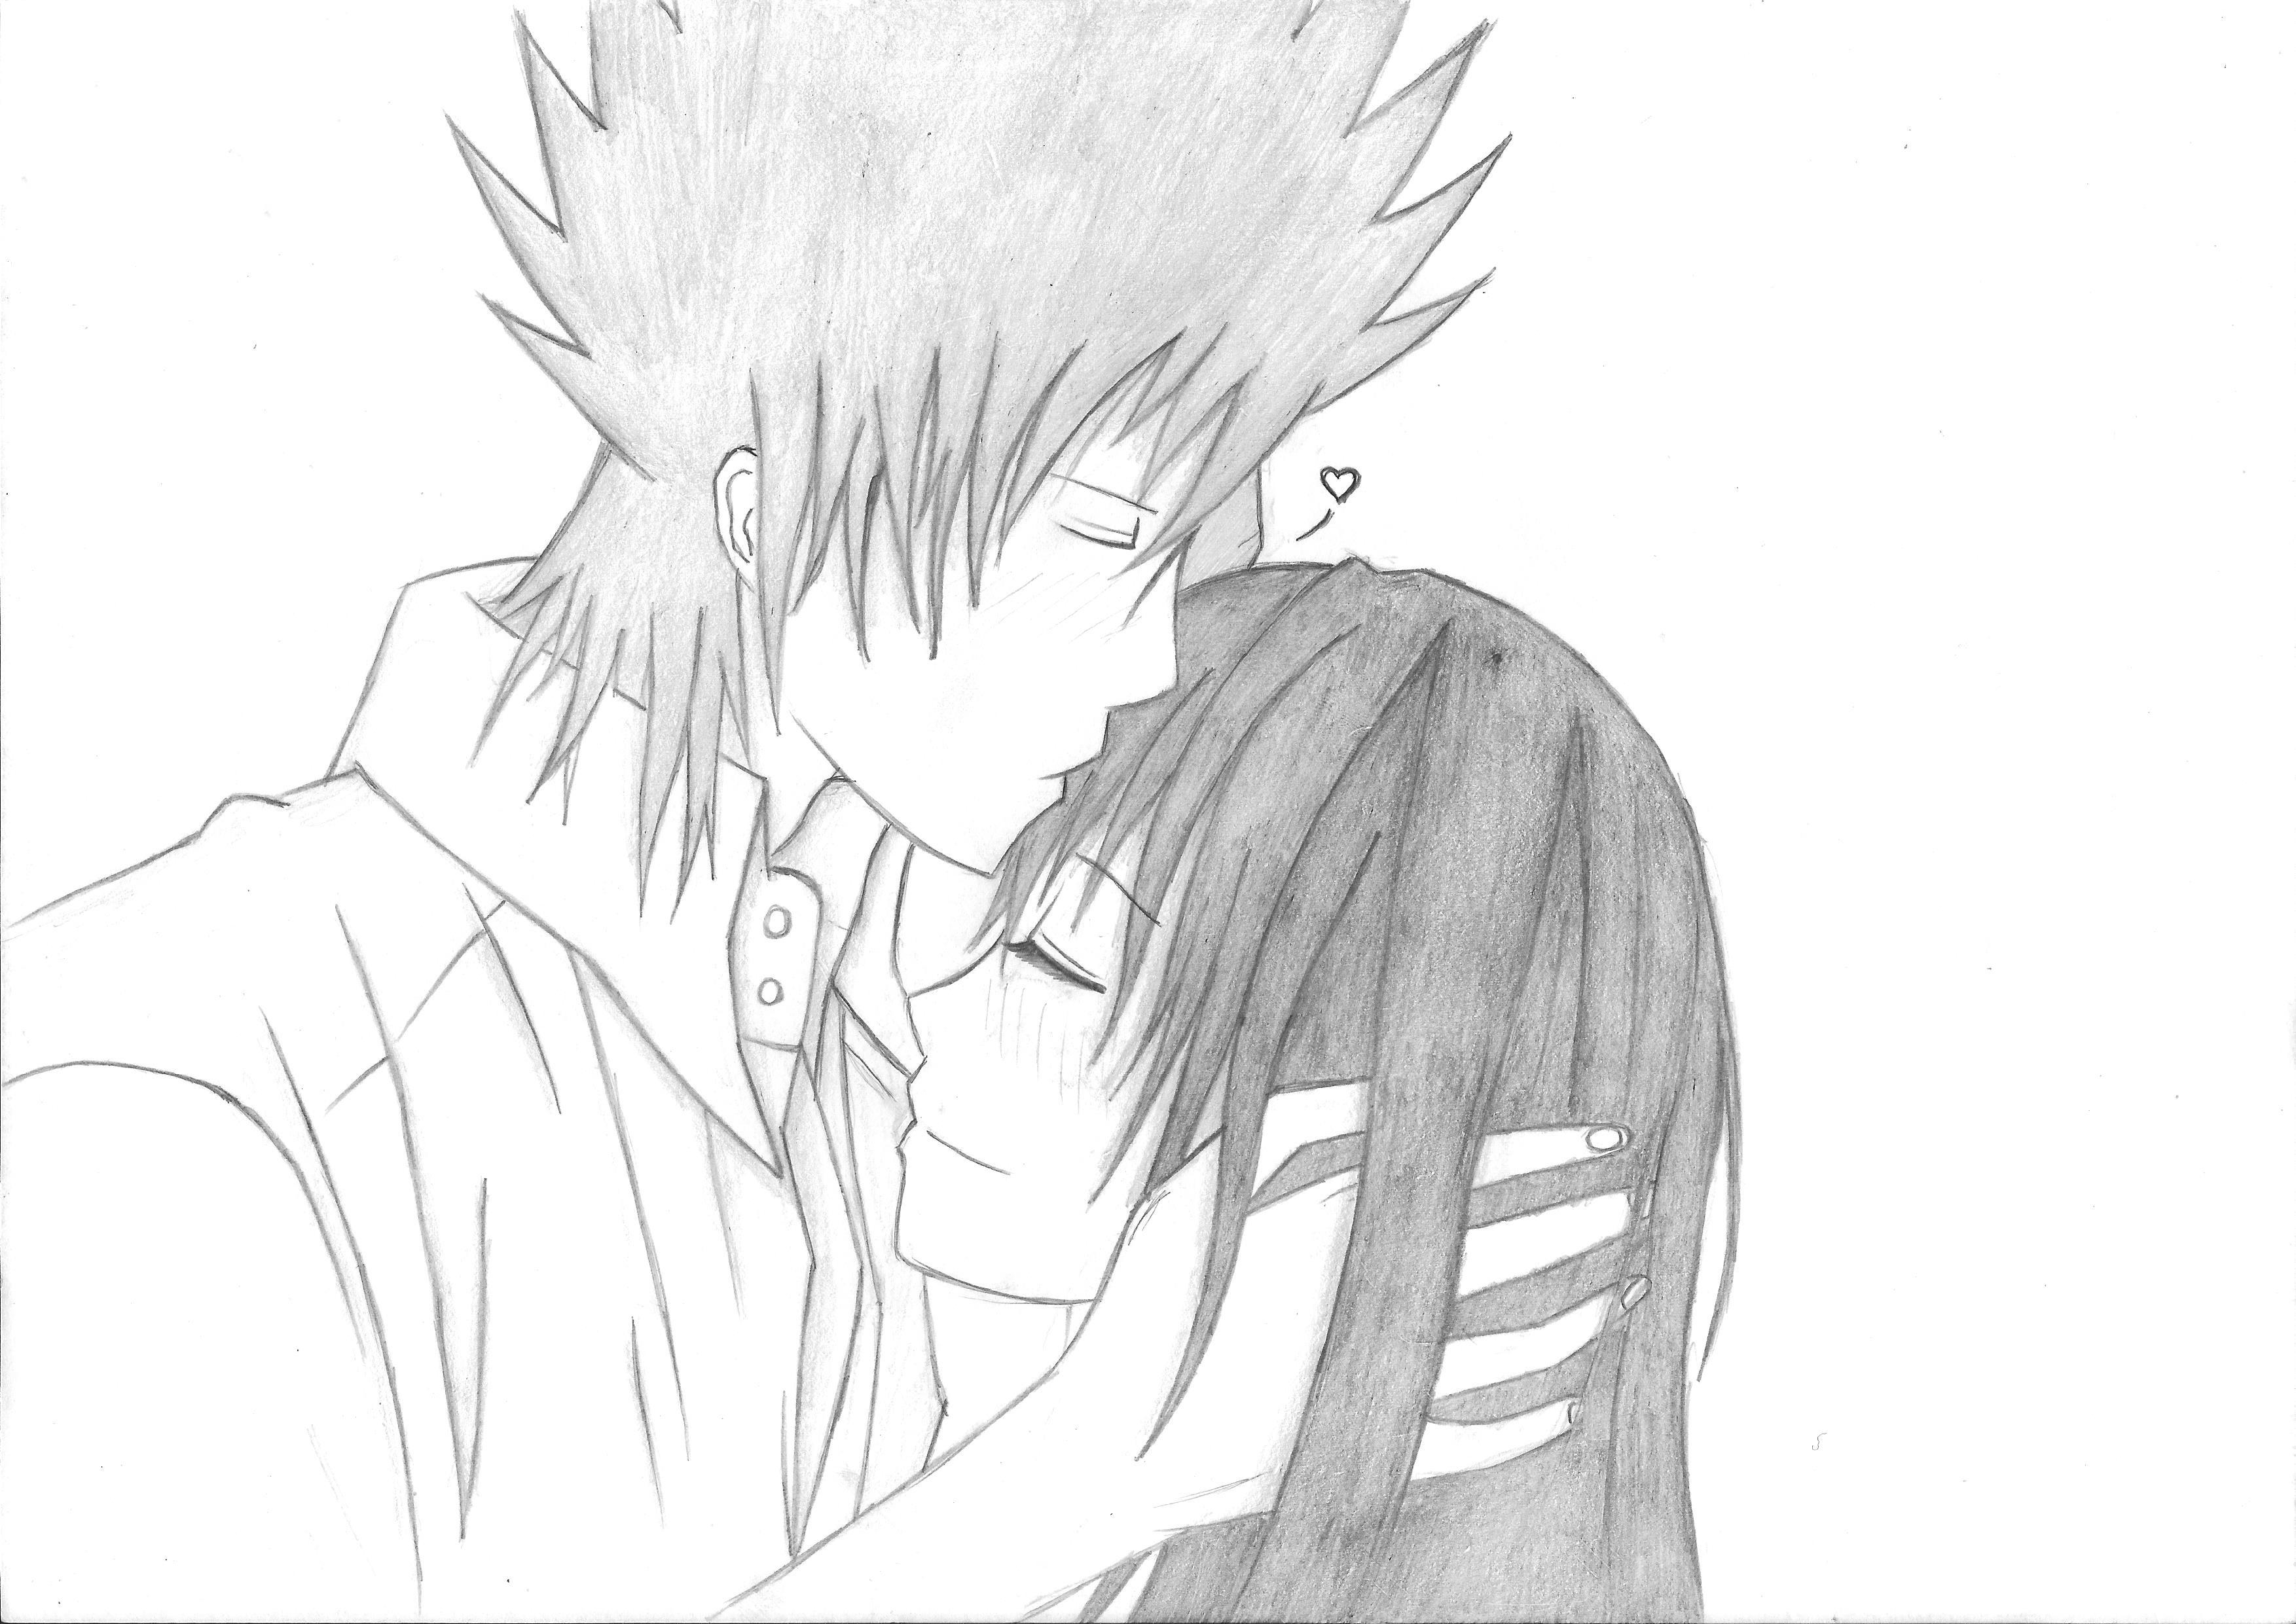 Drawn kisses romantic kissing (Complete)  (Complete) Romantic Kiss